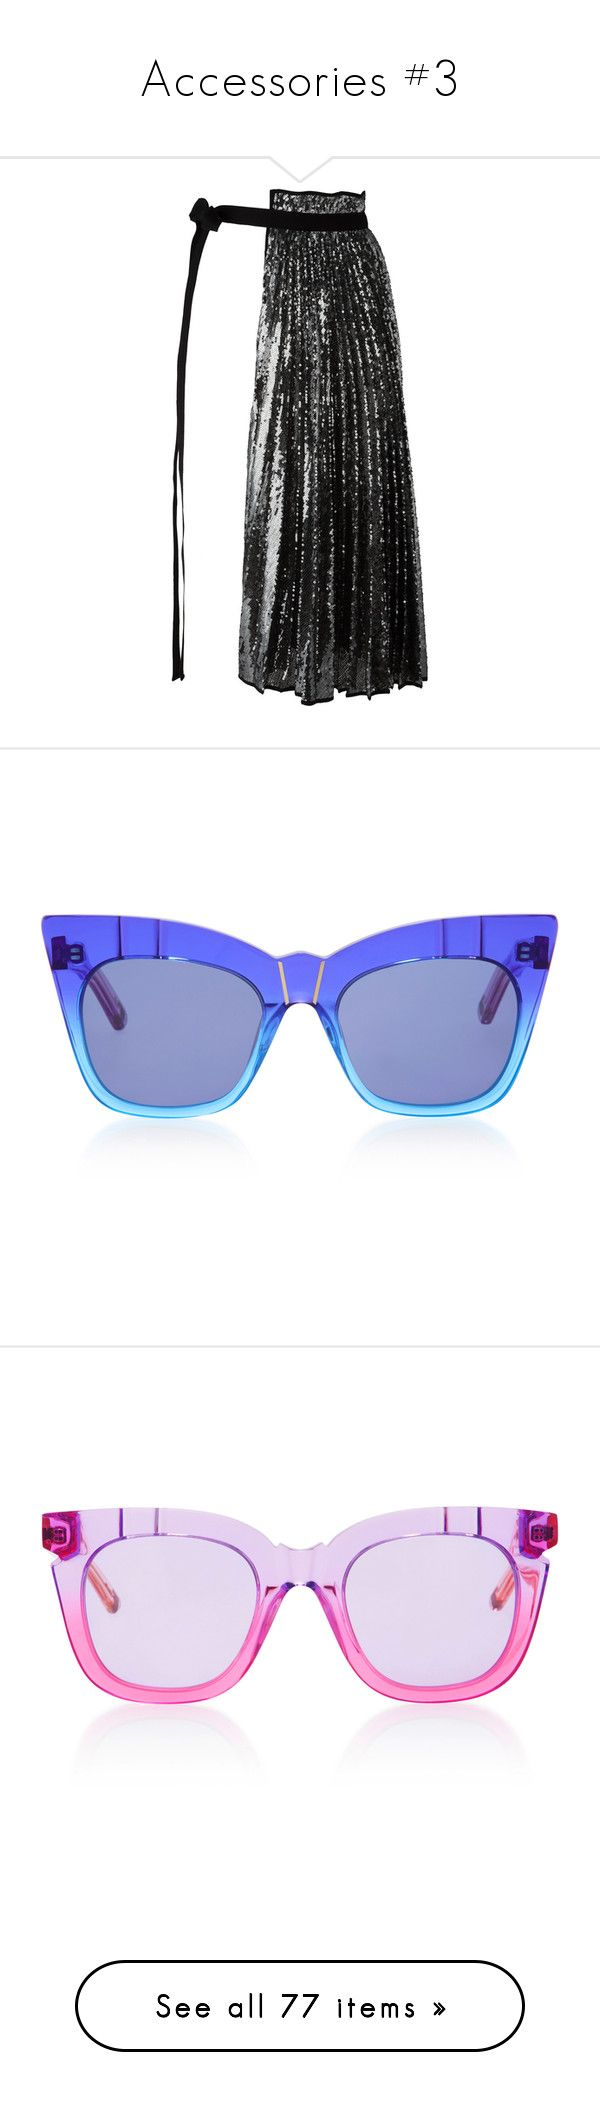 """Accessories #3"" by deborahsauveur ❤ liked on Polyvore featuring accessories, belts, skirts, black, metallic belts, tie belt, self tie belt, eyewear, sunglasses and cat-eye glasses"